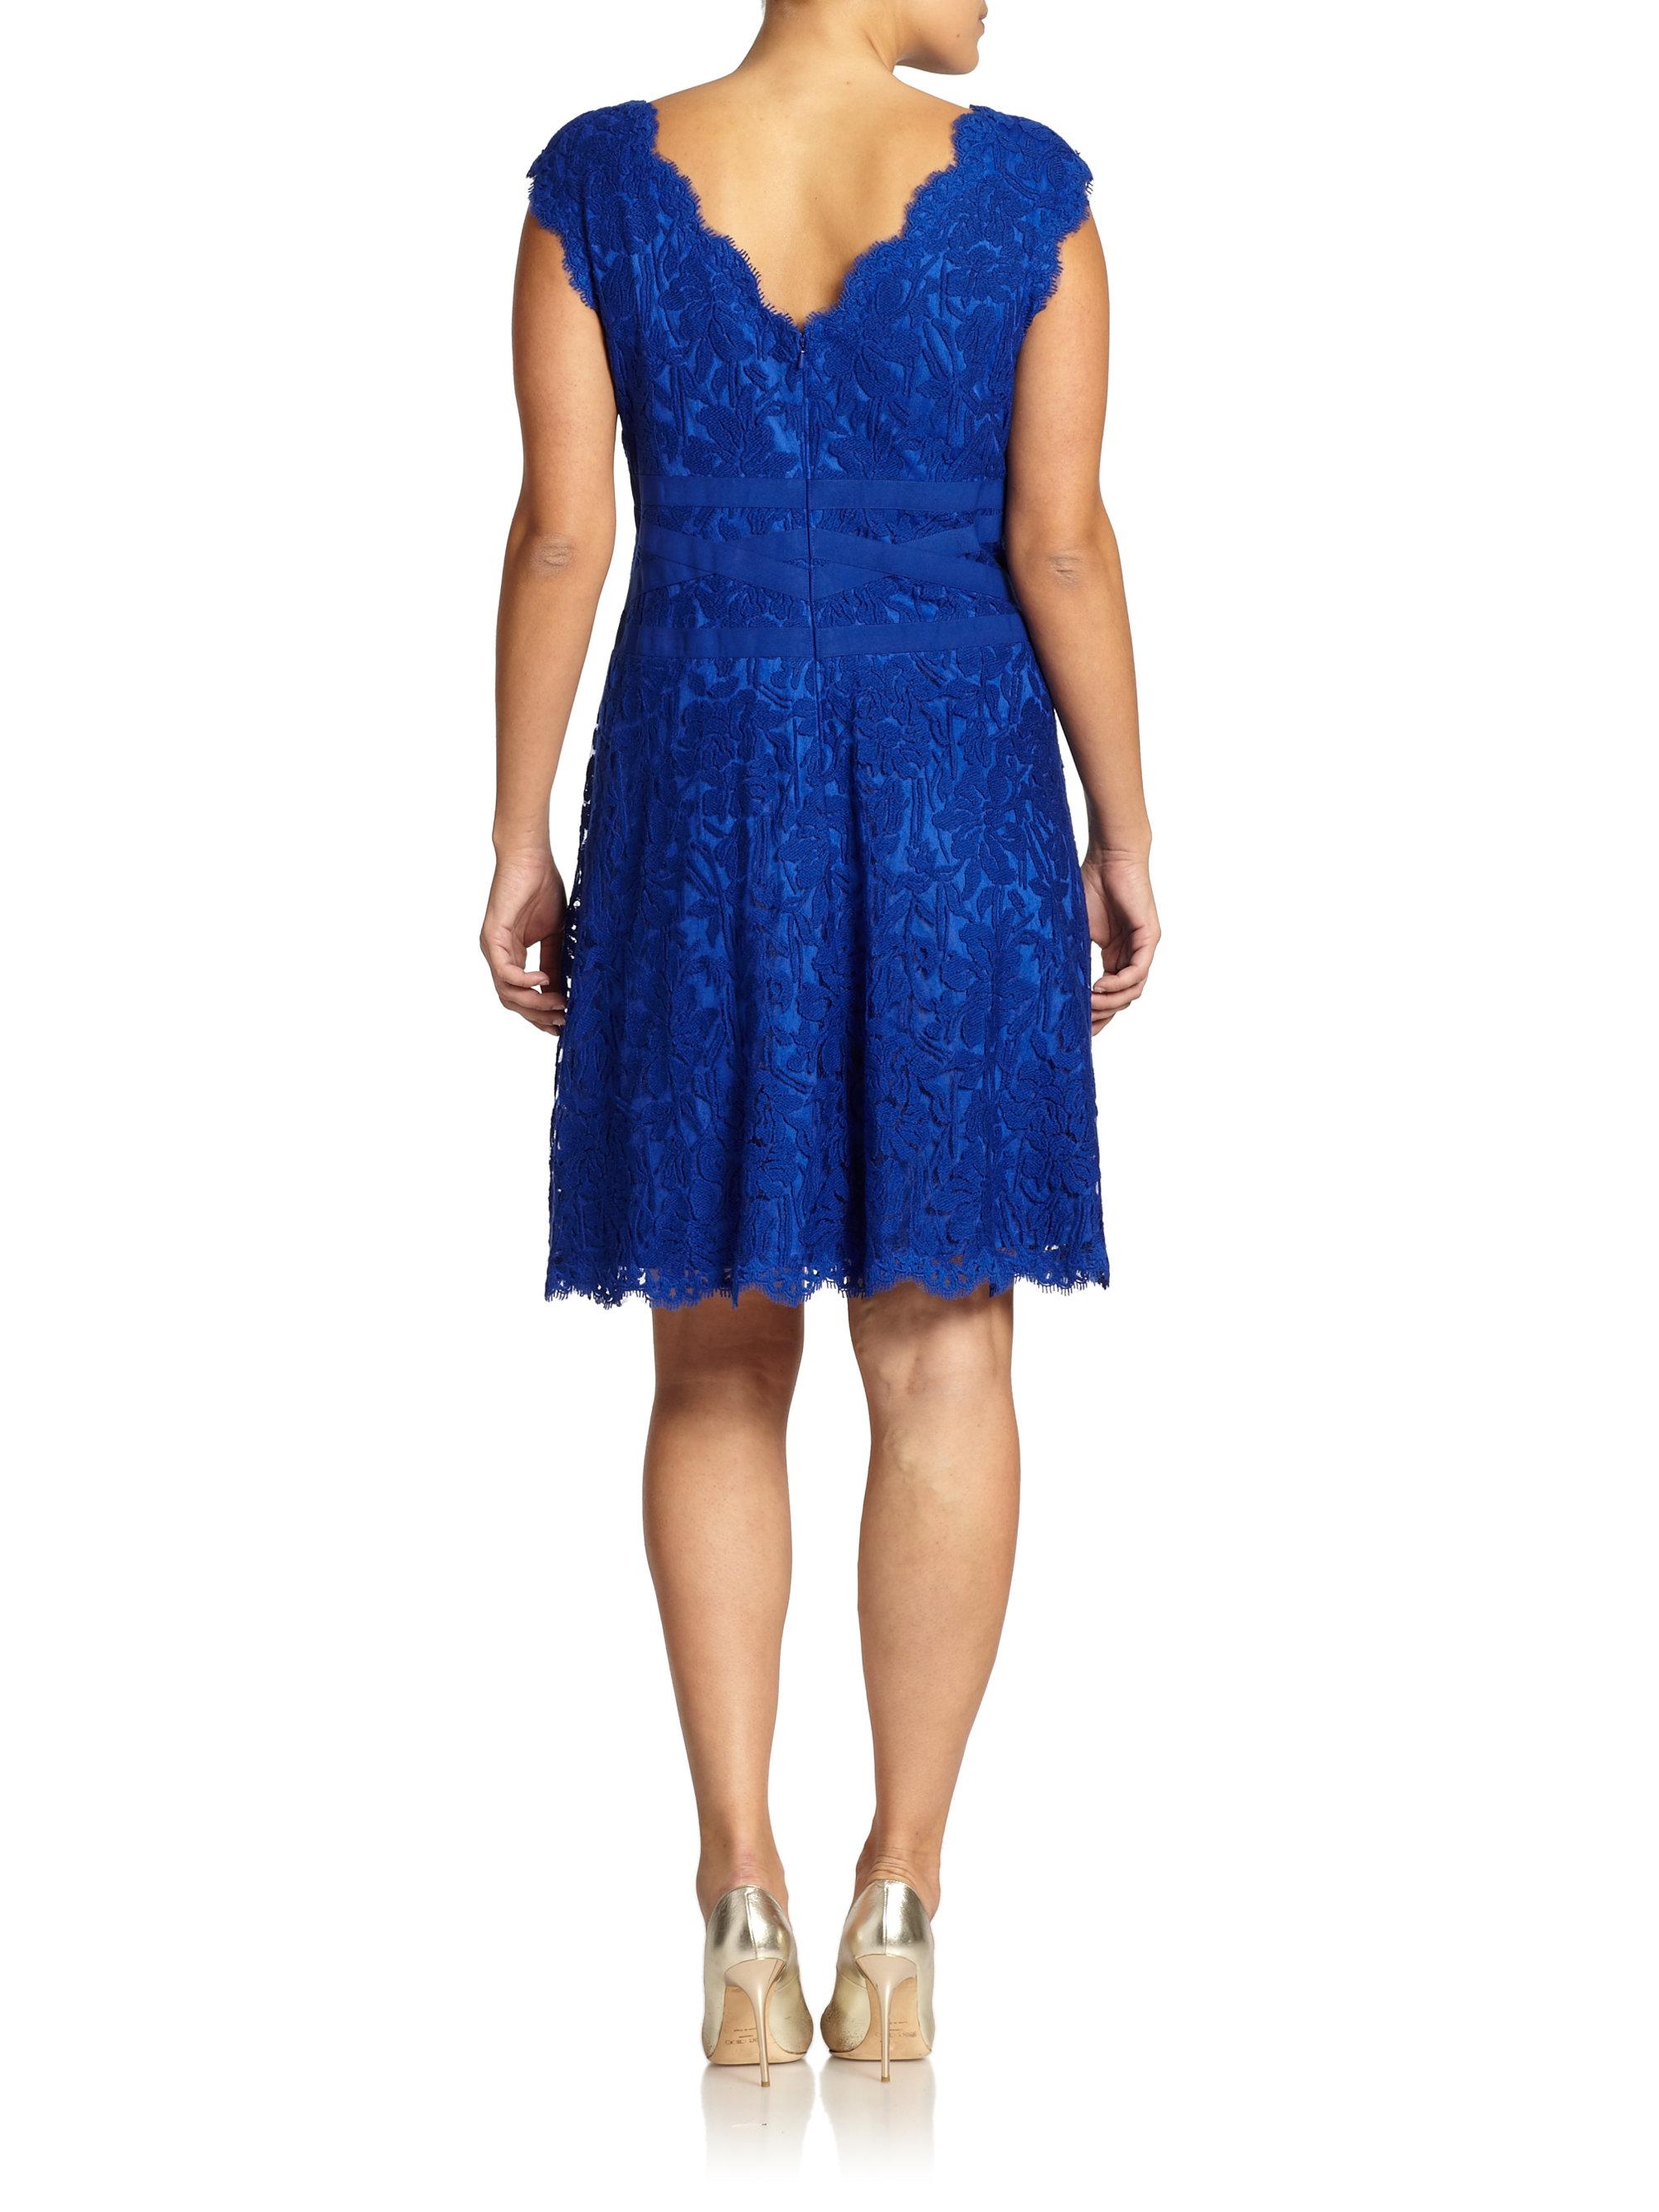 Tadashi shoji embroidered lace v neck dress in blue